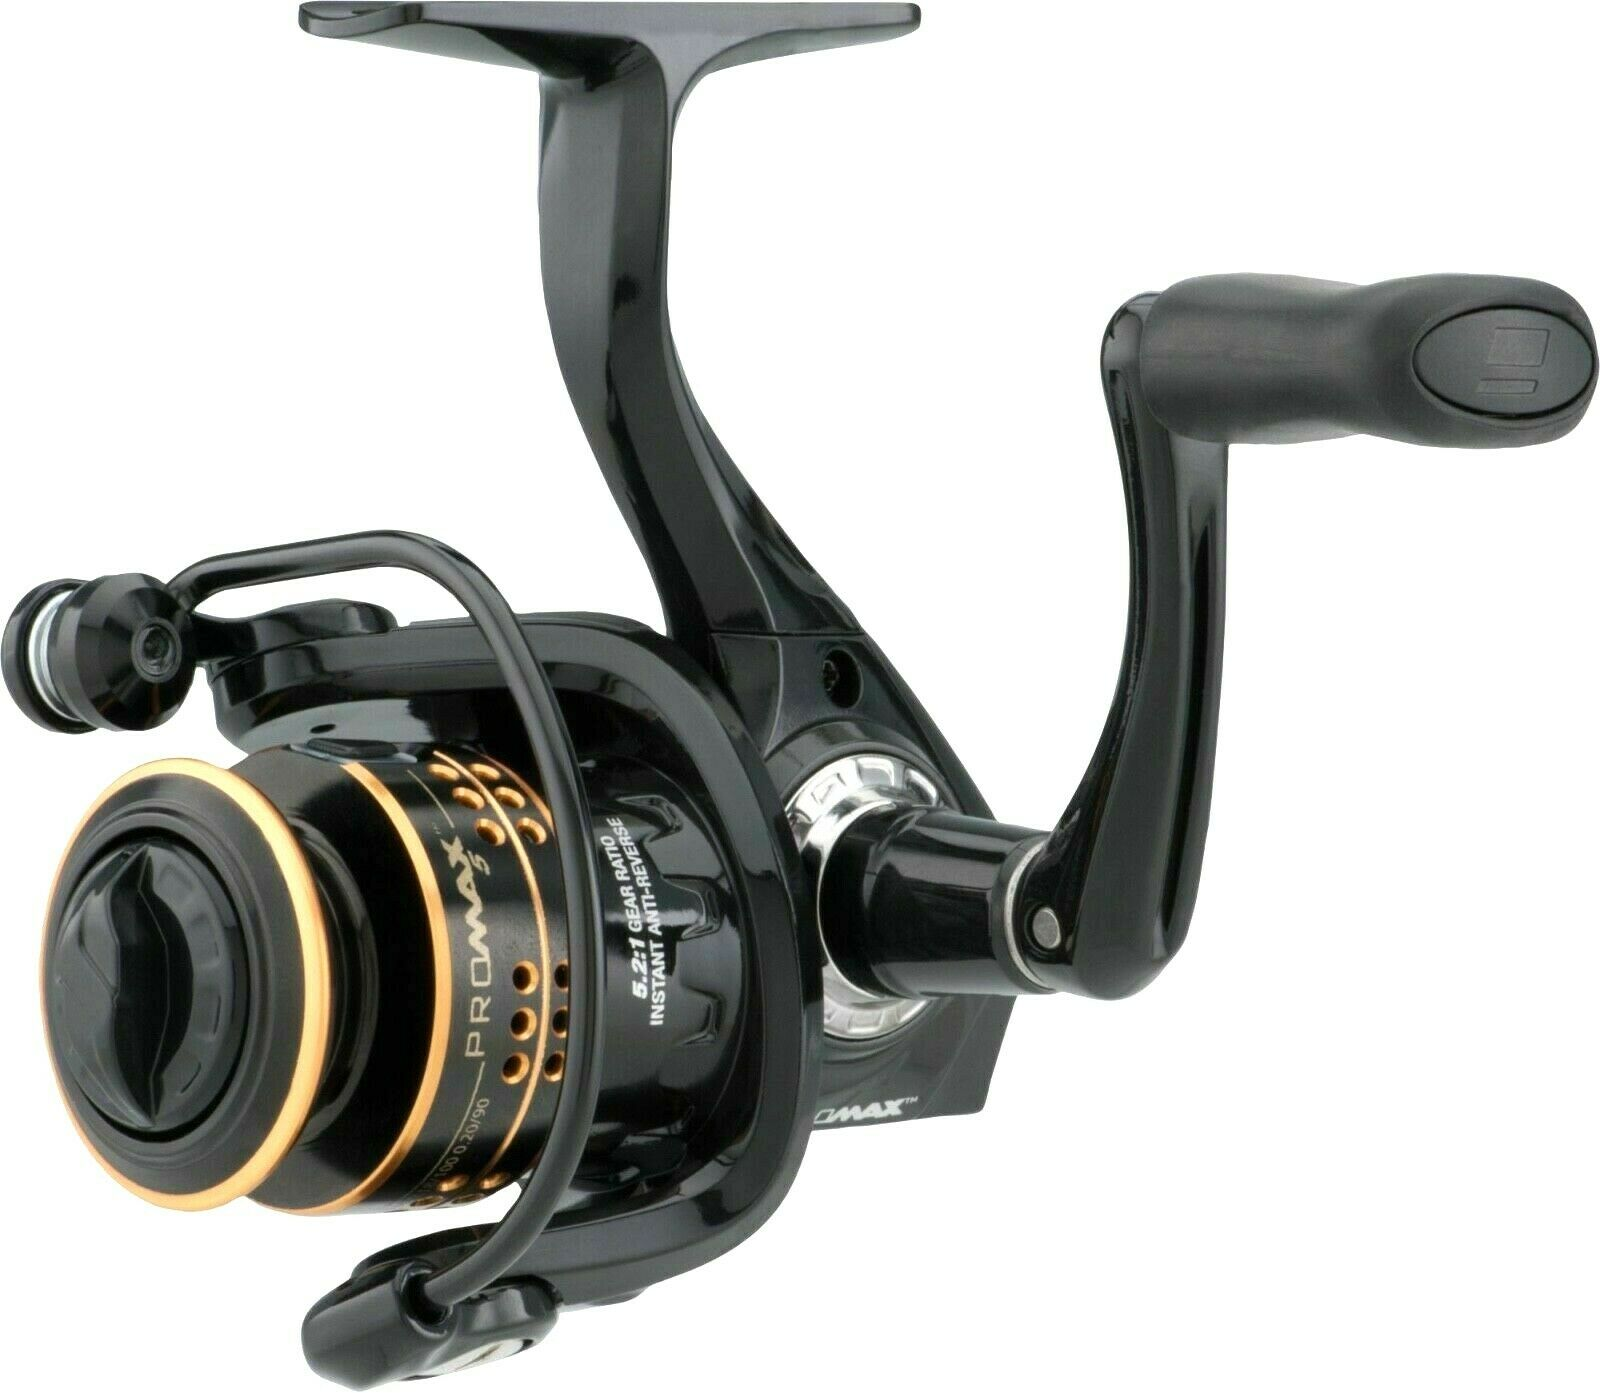 Nuevo Abu Garcia Promax 30 Spinning Reel De Pesca PMAXSP30 Pantalla De Piso